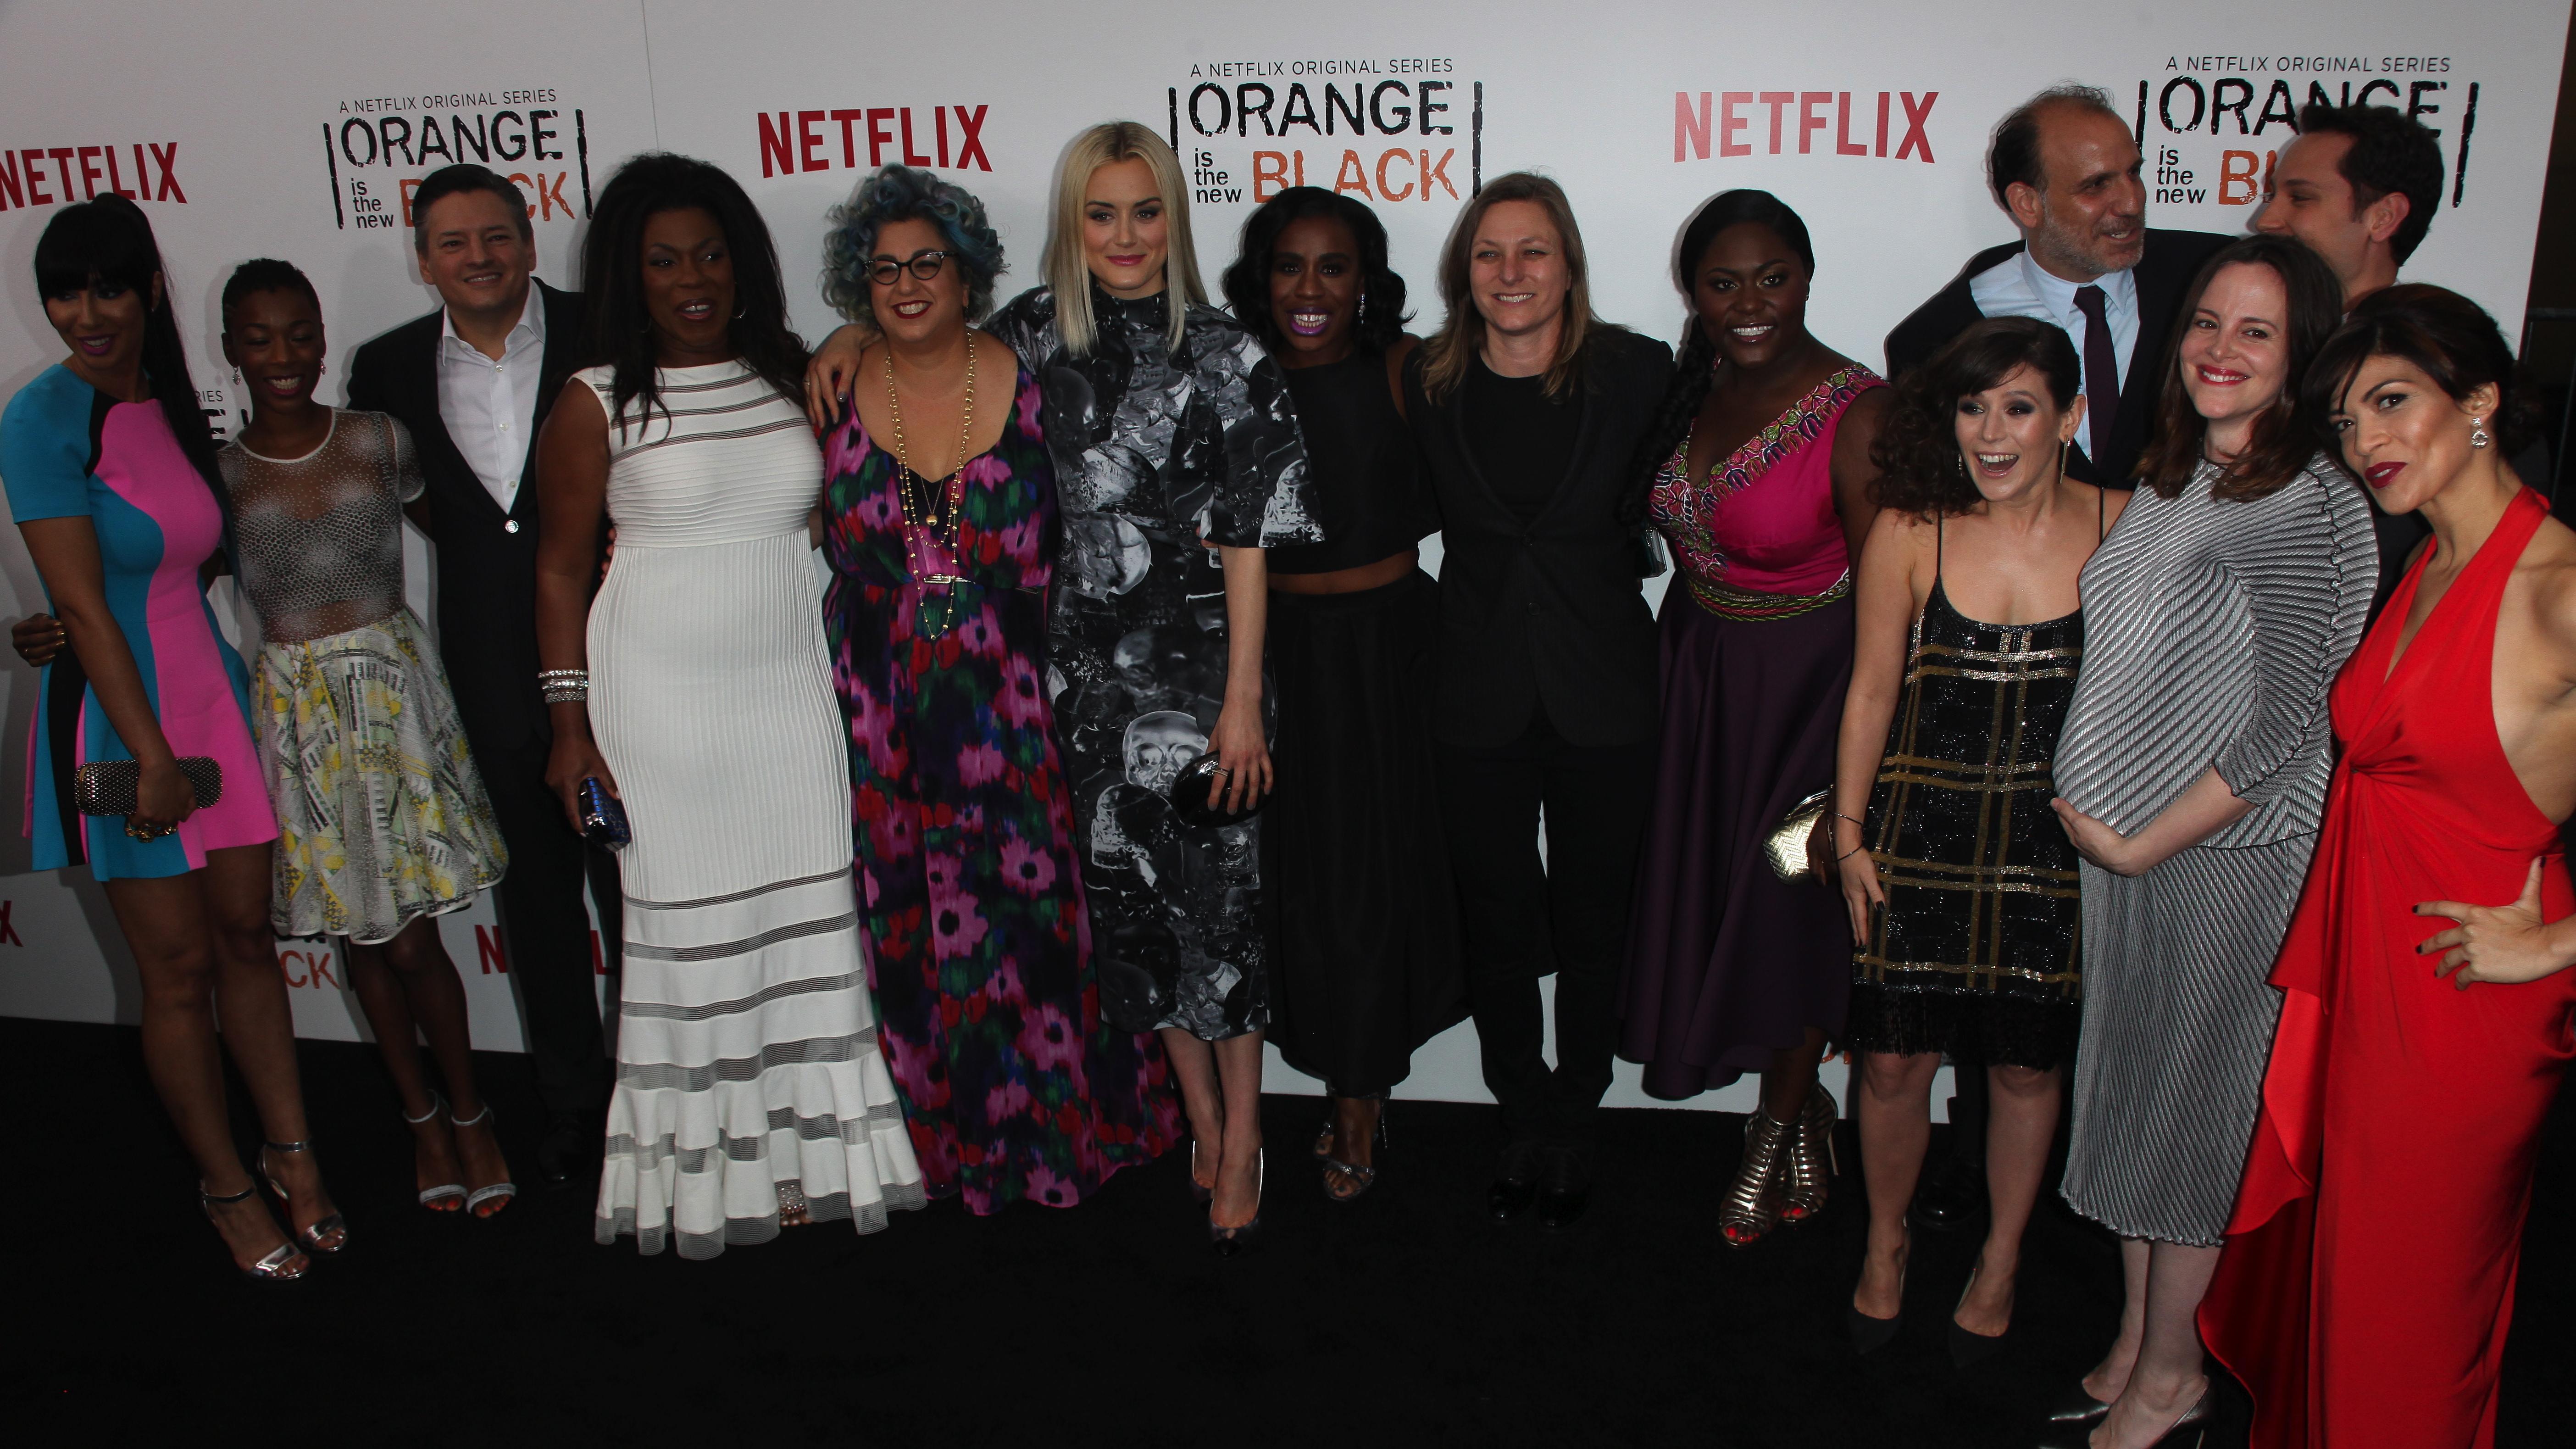 orange is the new black season 2 premiere